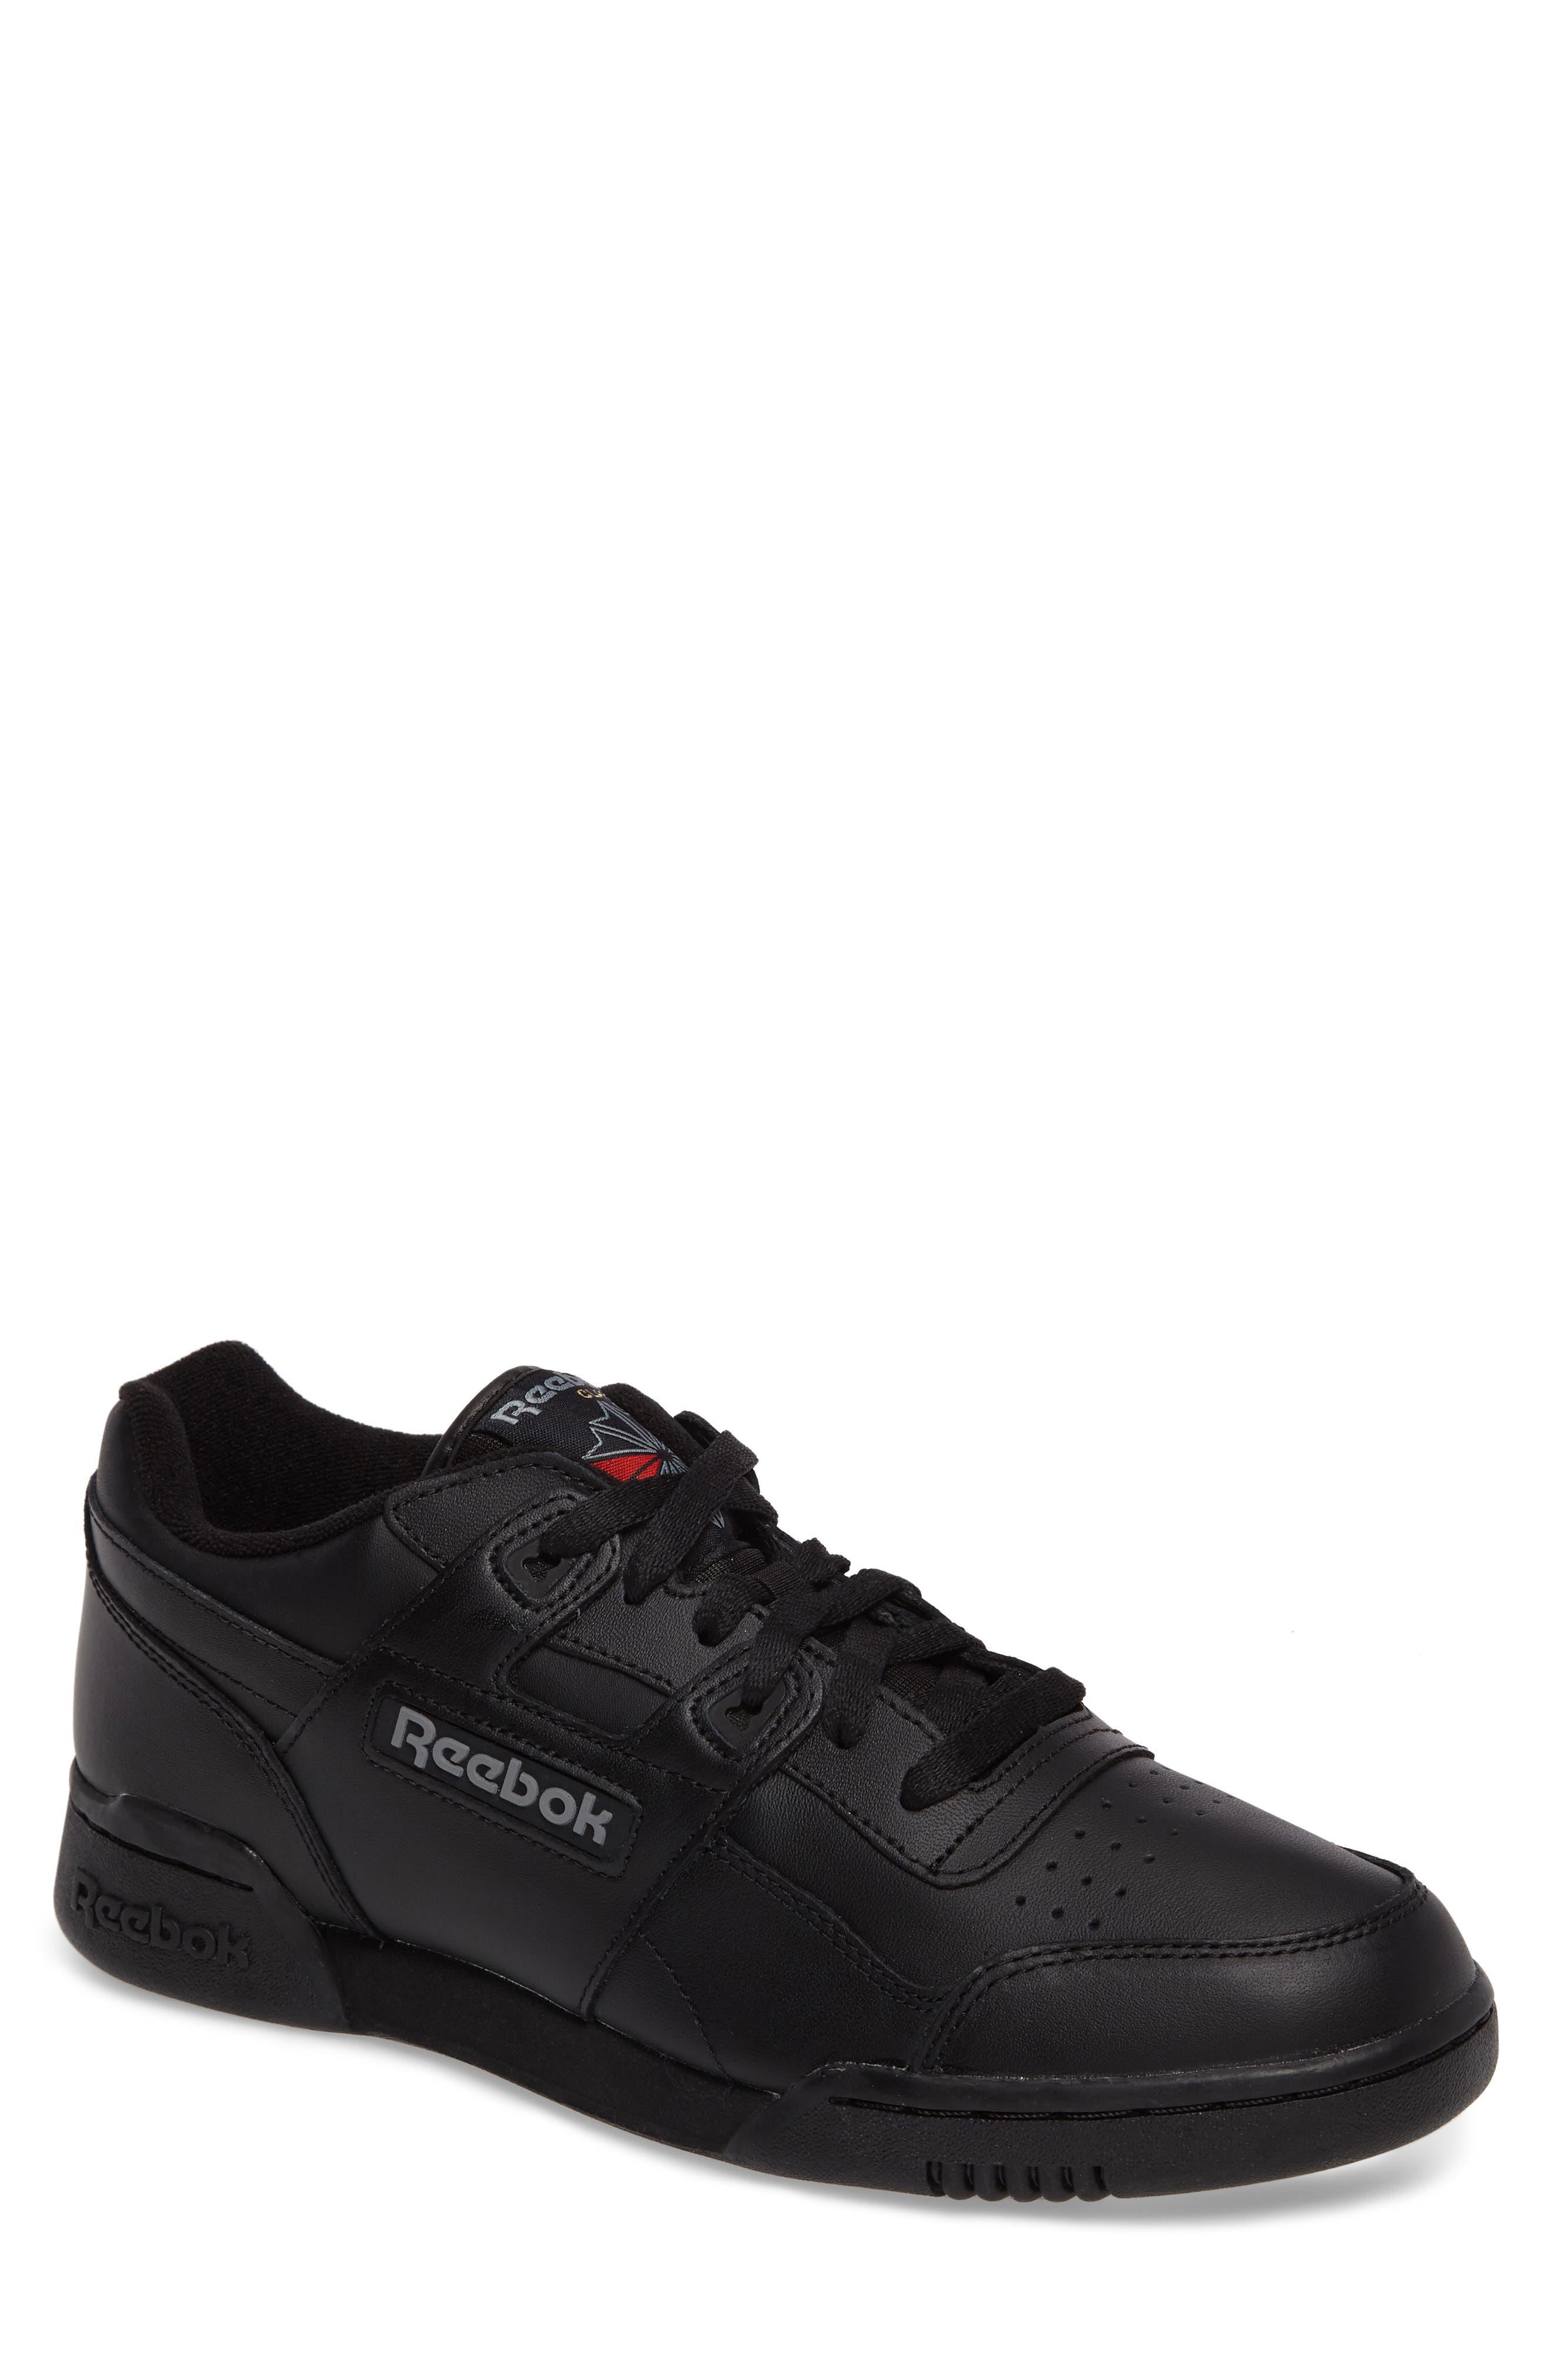 Workout Plus Sneaker,                         Main,                         color, Black/ Charcoal